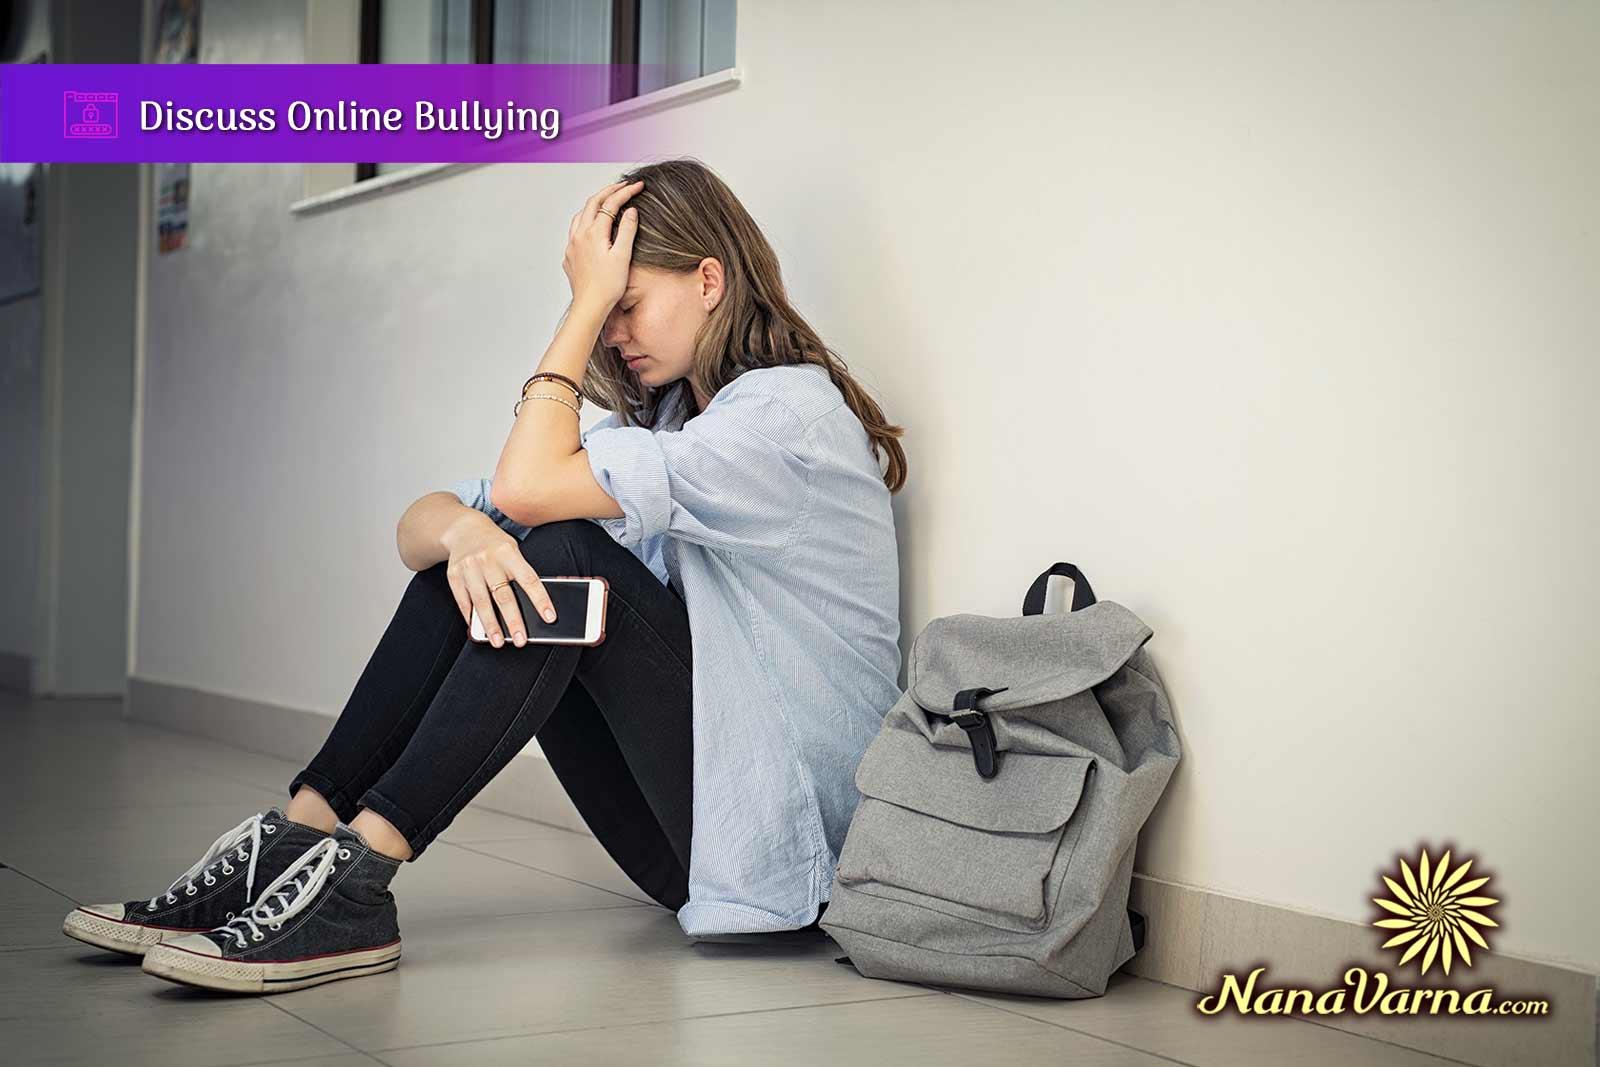 Online Safety Tips for children 06